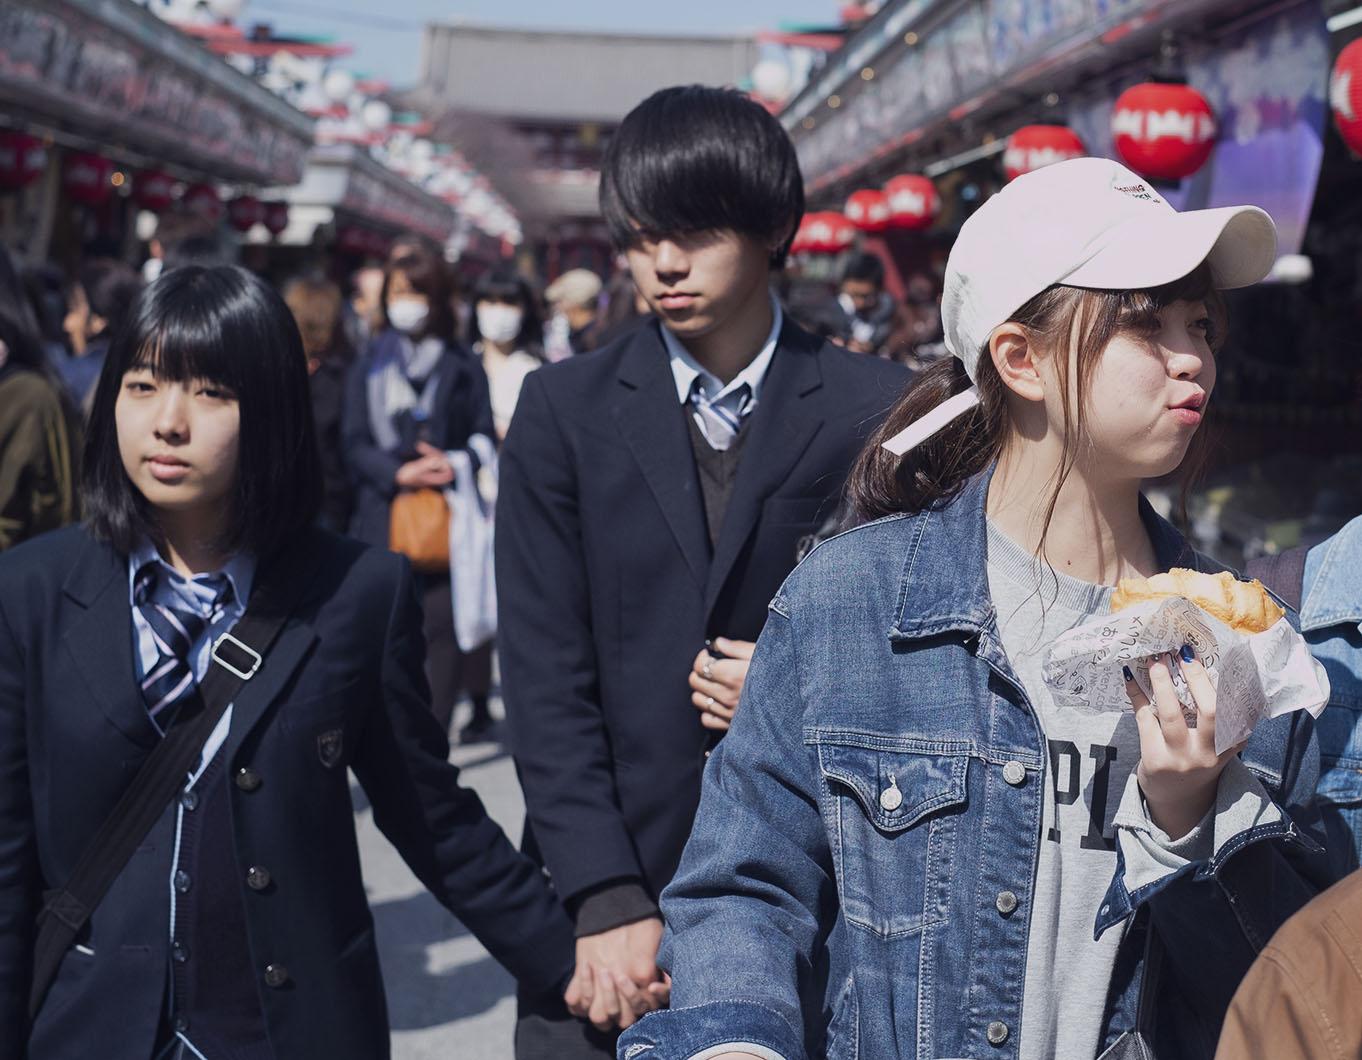 Tokyo_Shrine_Day3_kids.jpg